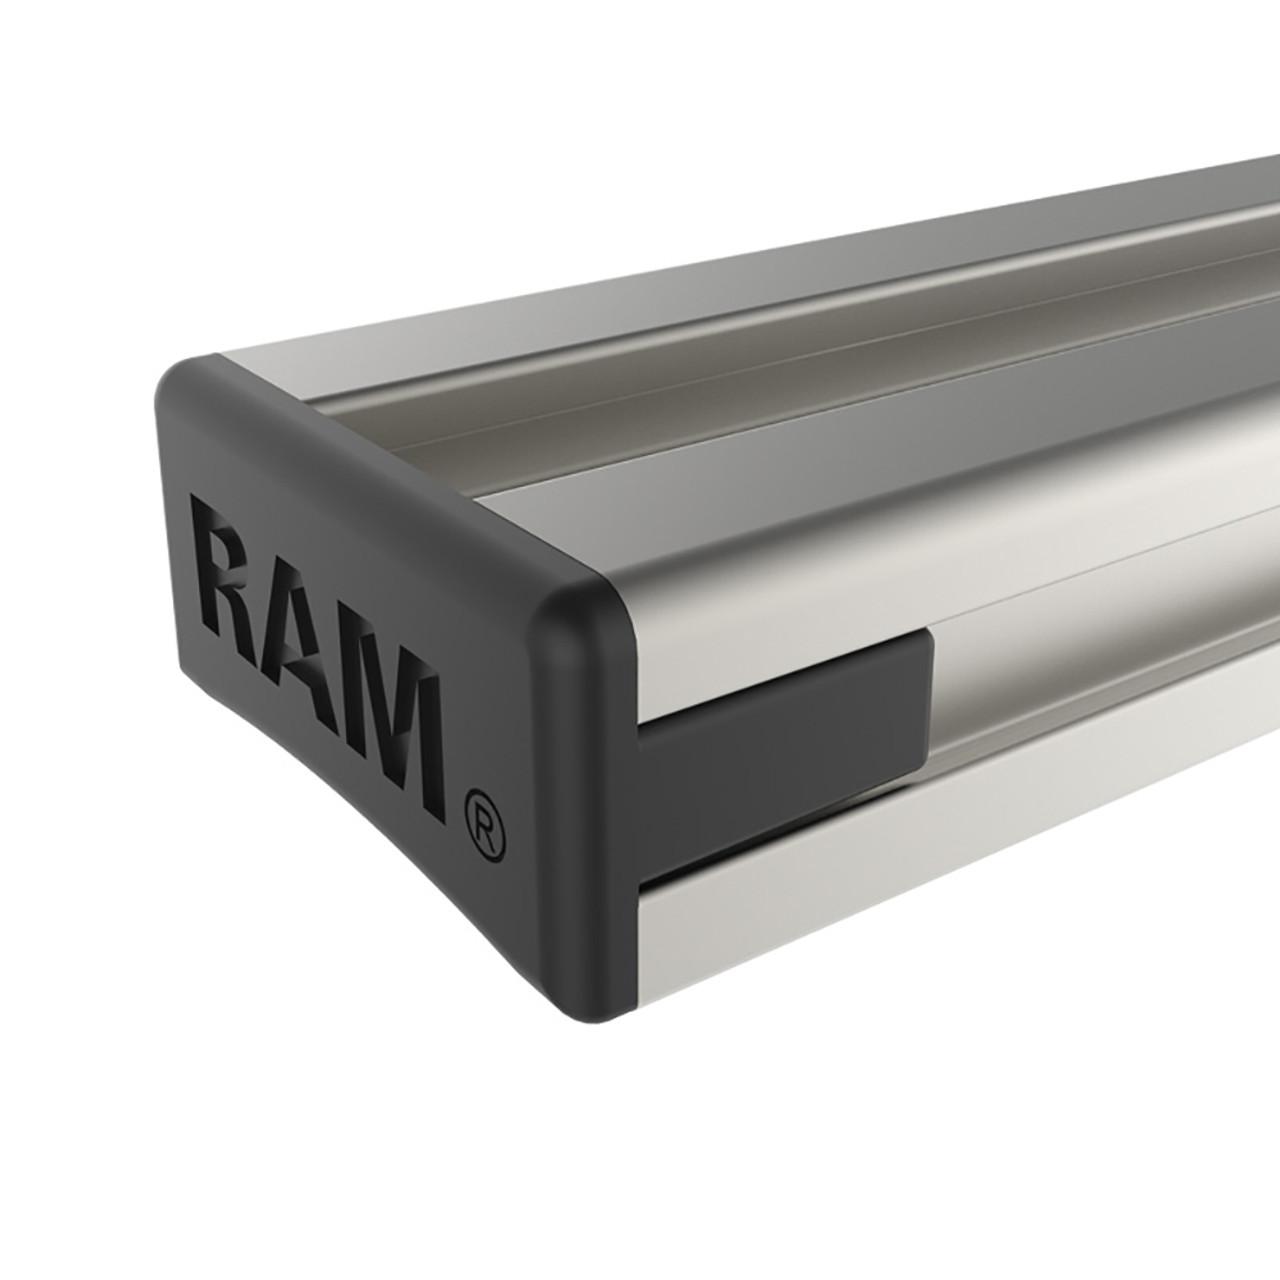 "Ram Mount 5"" Extruded Aluminum Tough-Track [RAM-TRACK-EXA-5]"